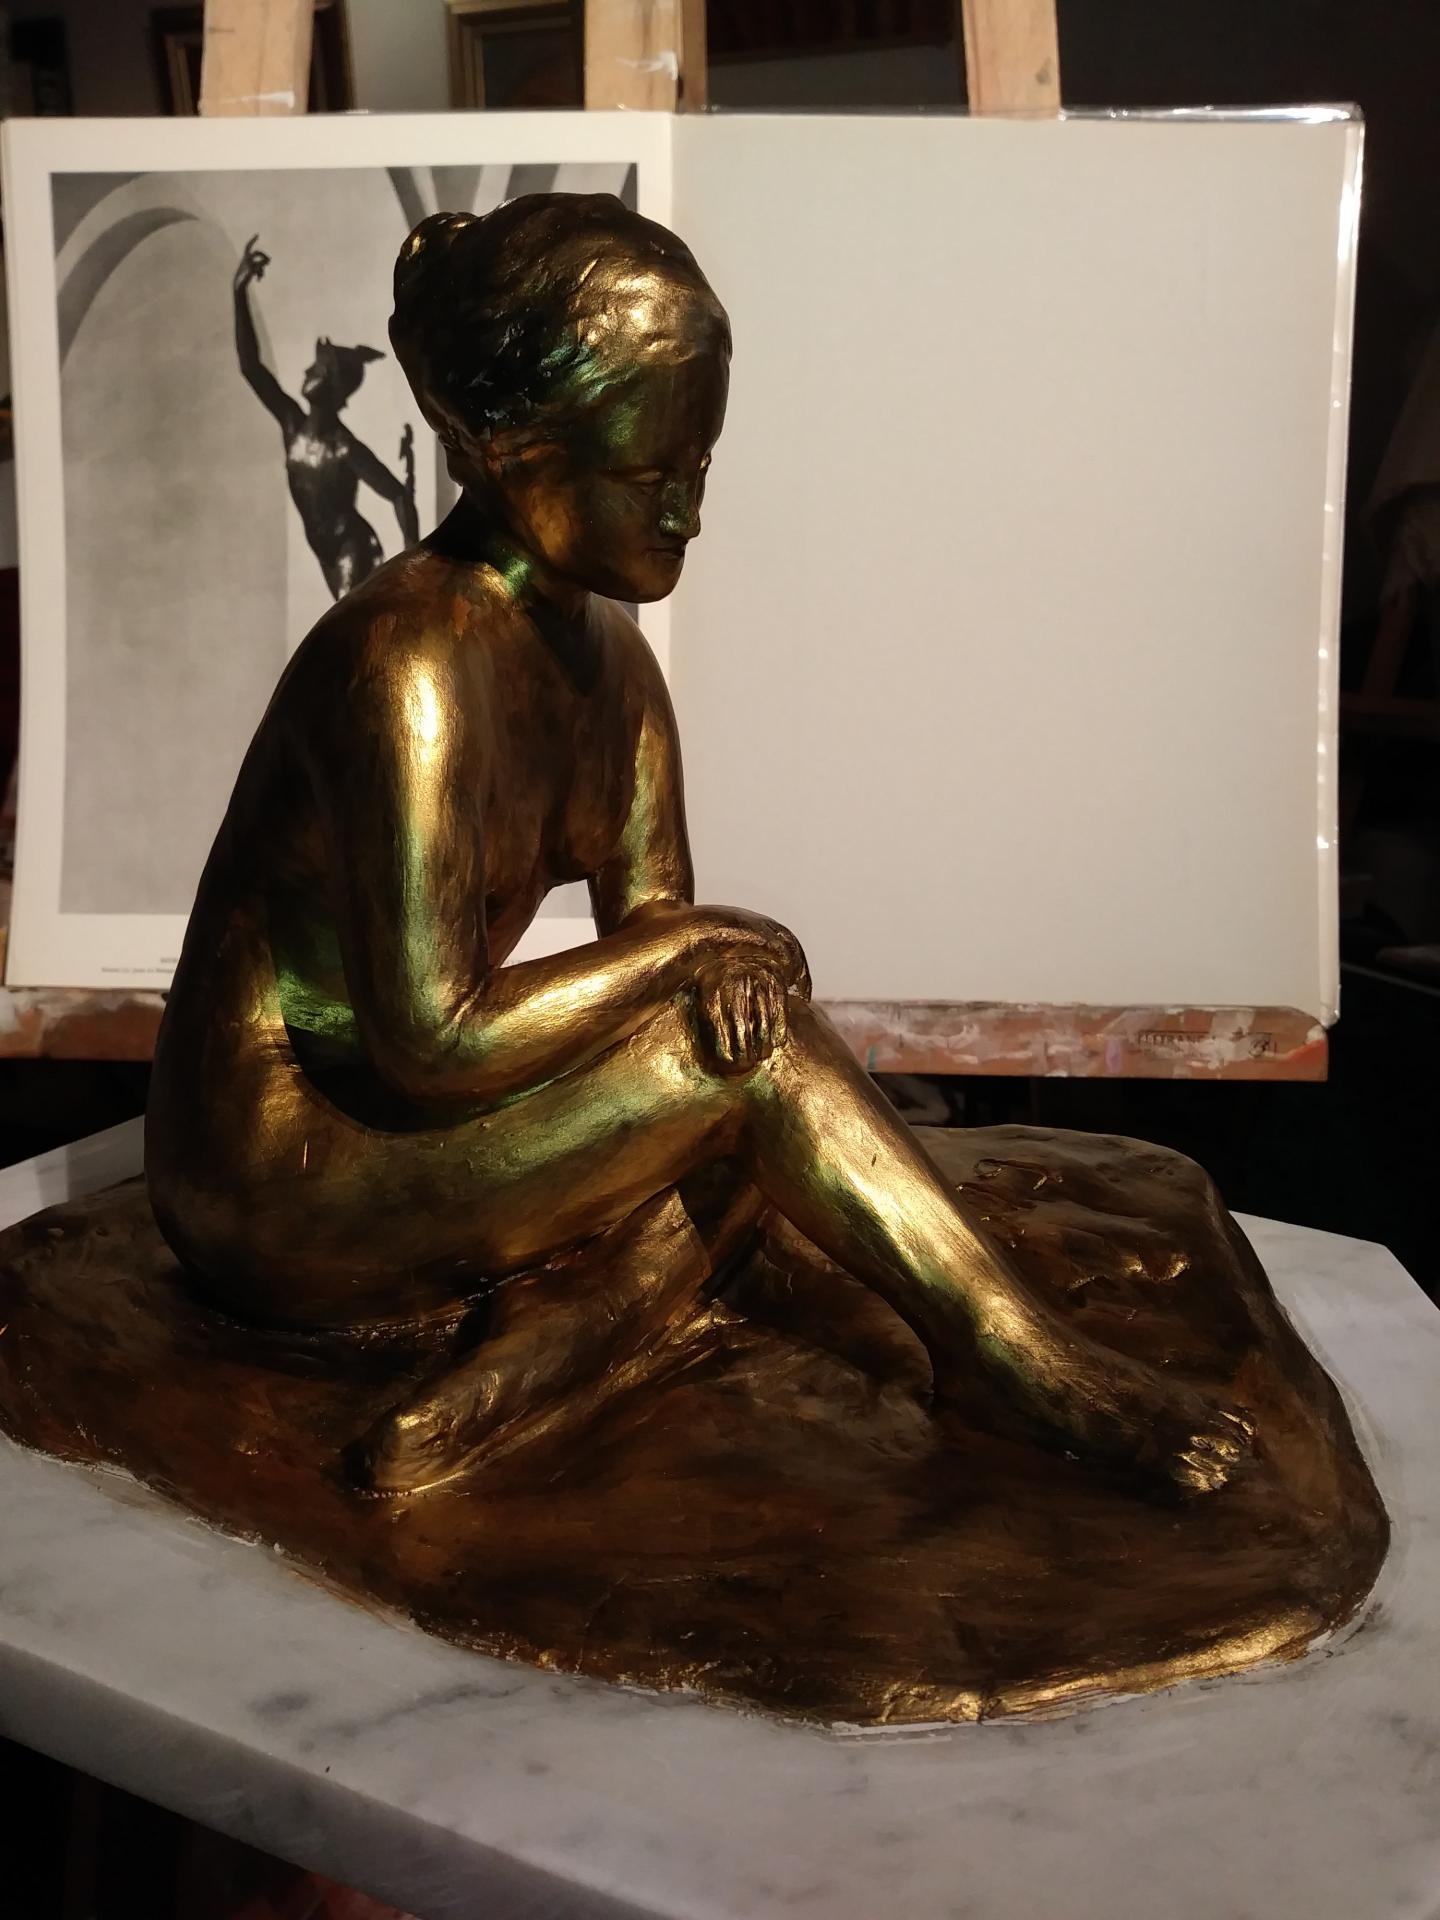 Sculpture de nue, argile patinée (baigneuse) 1